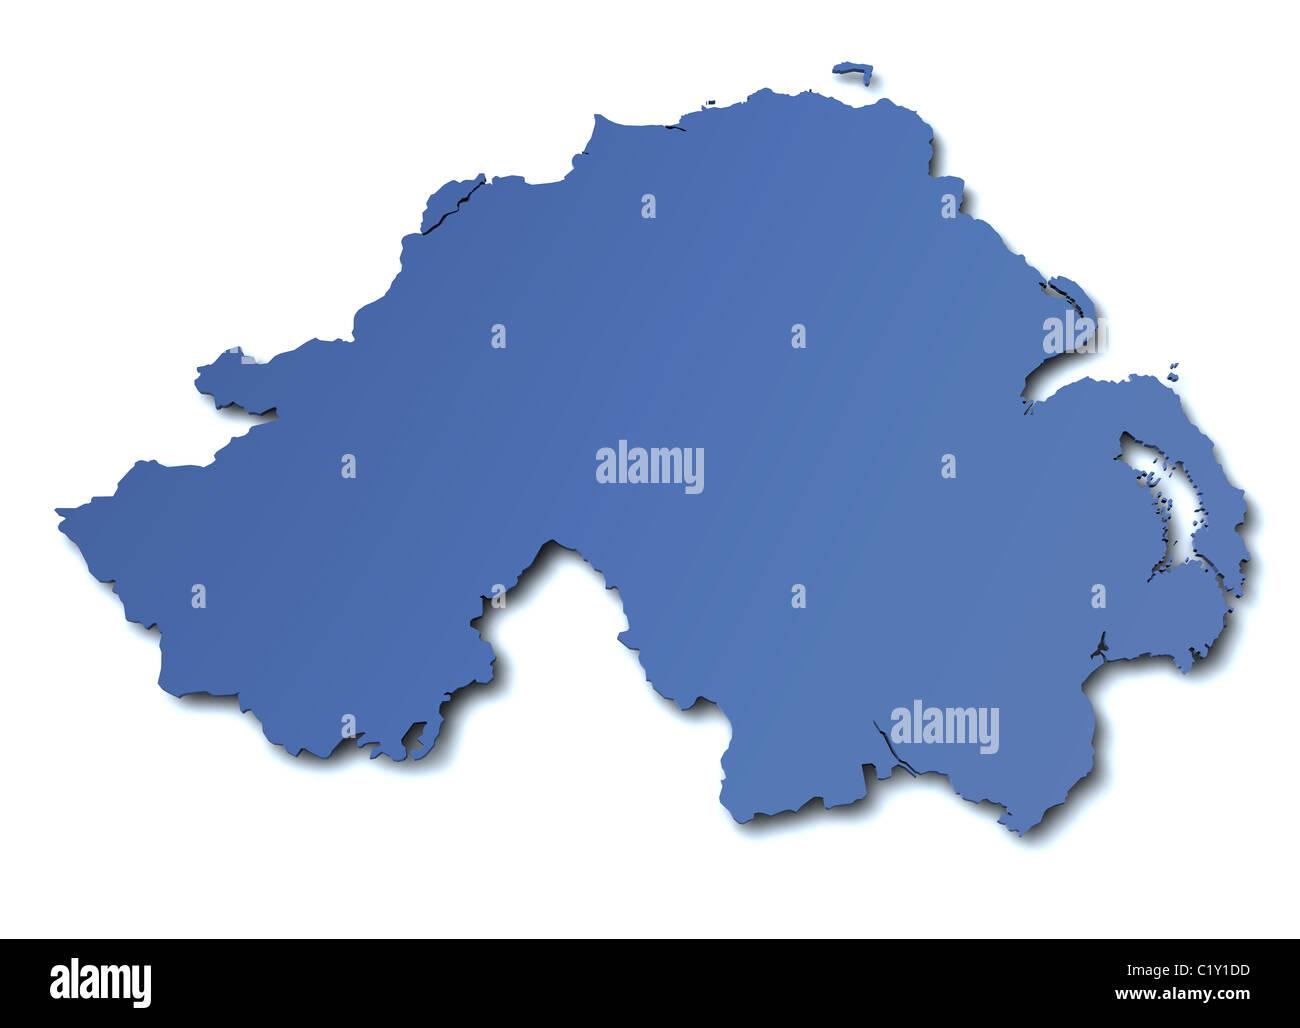 Map of Northern Ireland - UK - Stock Image